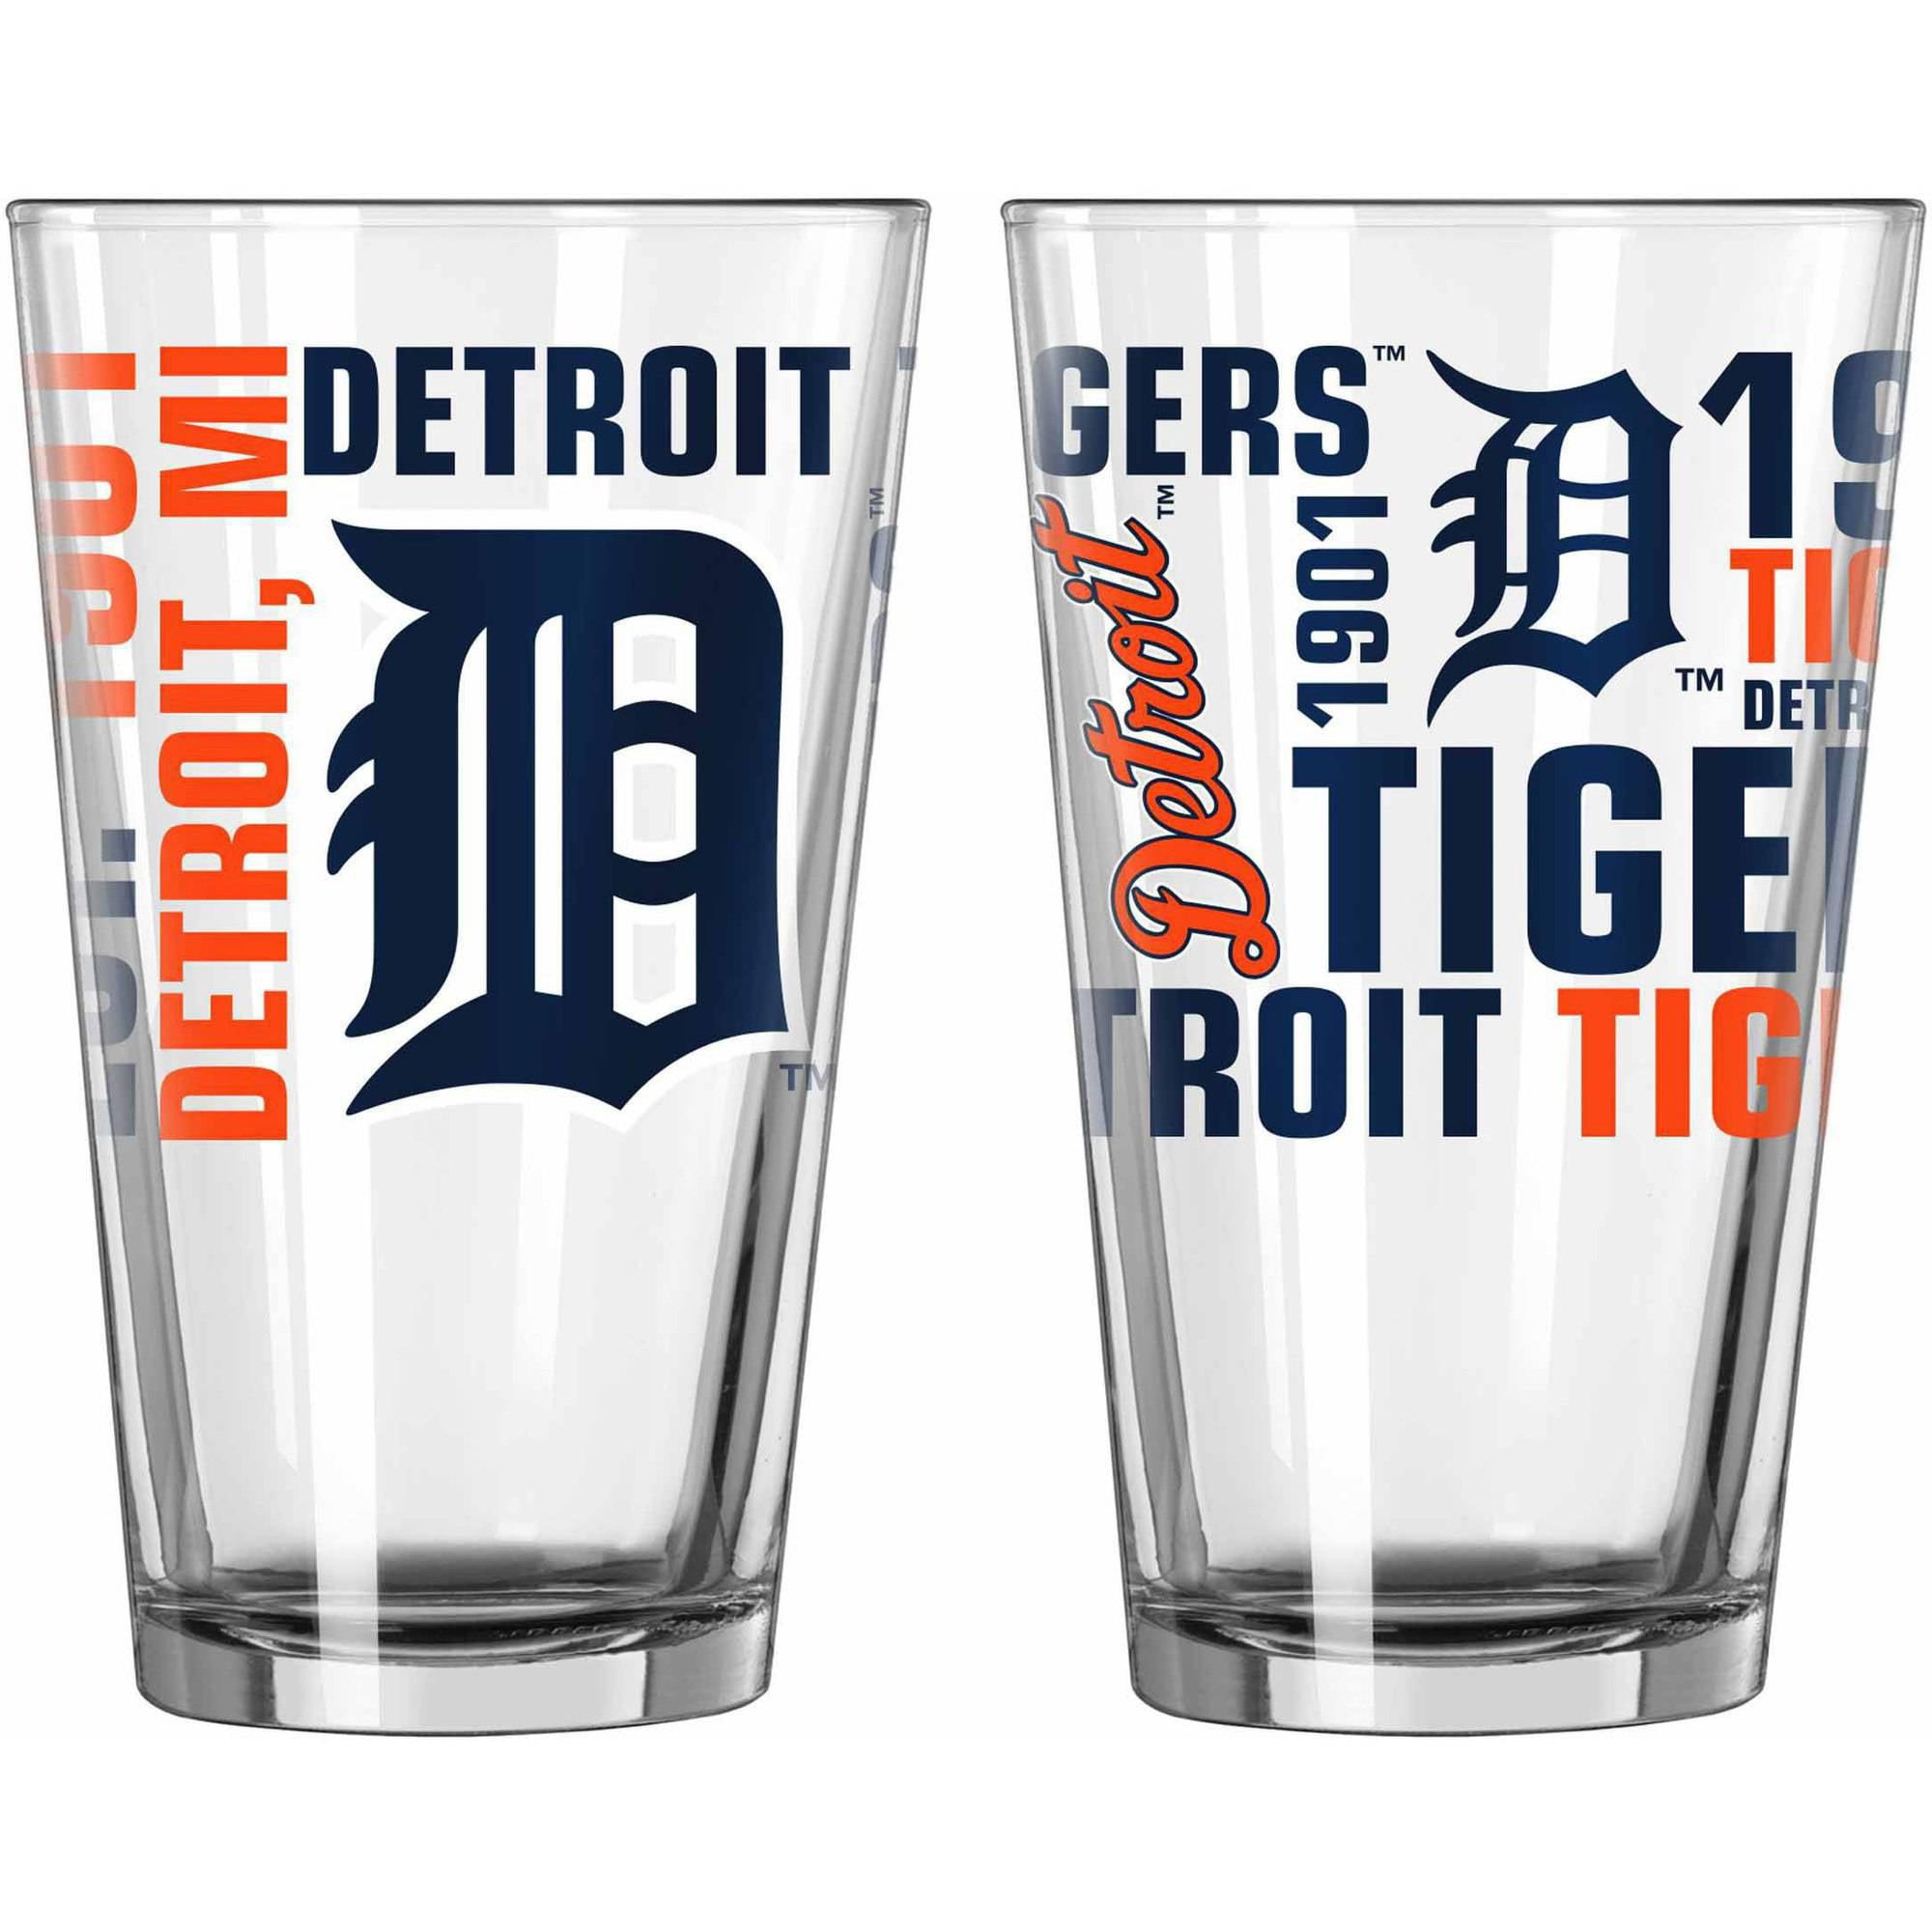 Boelter Brands NCAA Set of Two 16 Ounce Spirit Pint Glass Set, Detroit Tigers by Boelter Brands